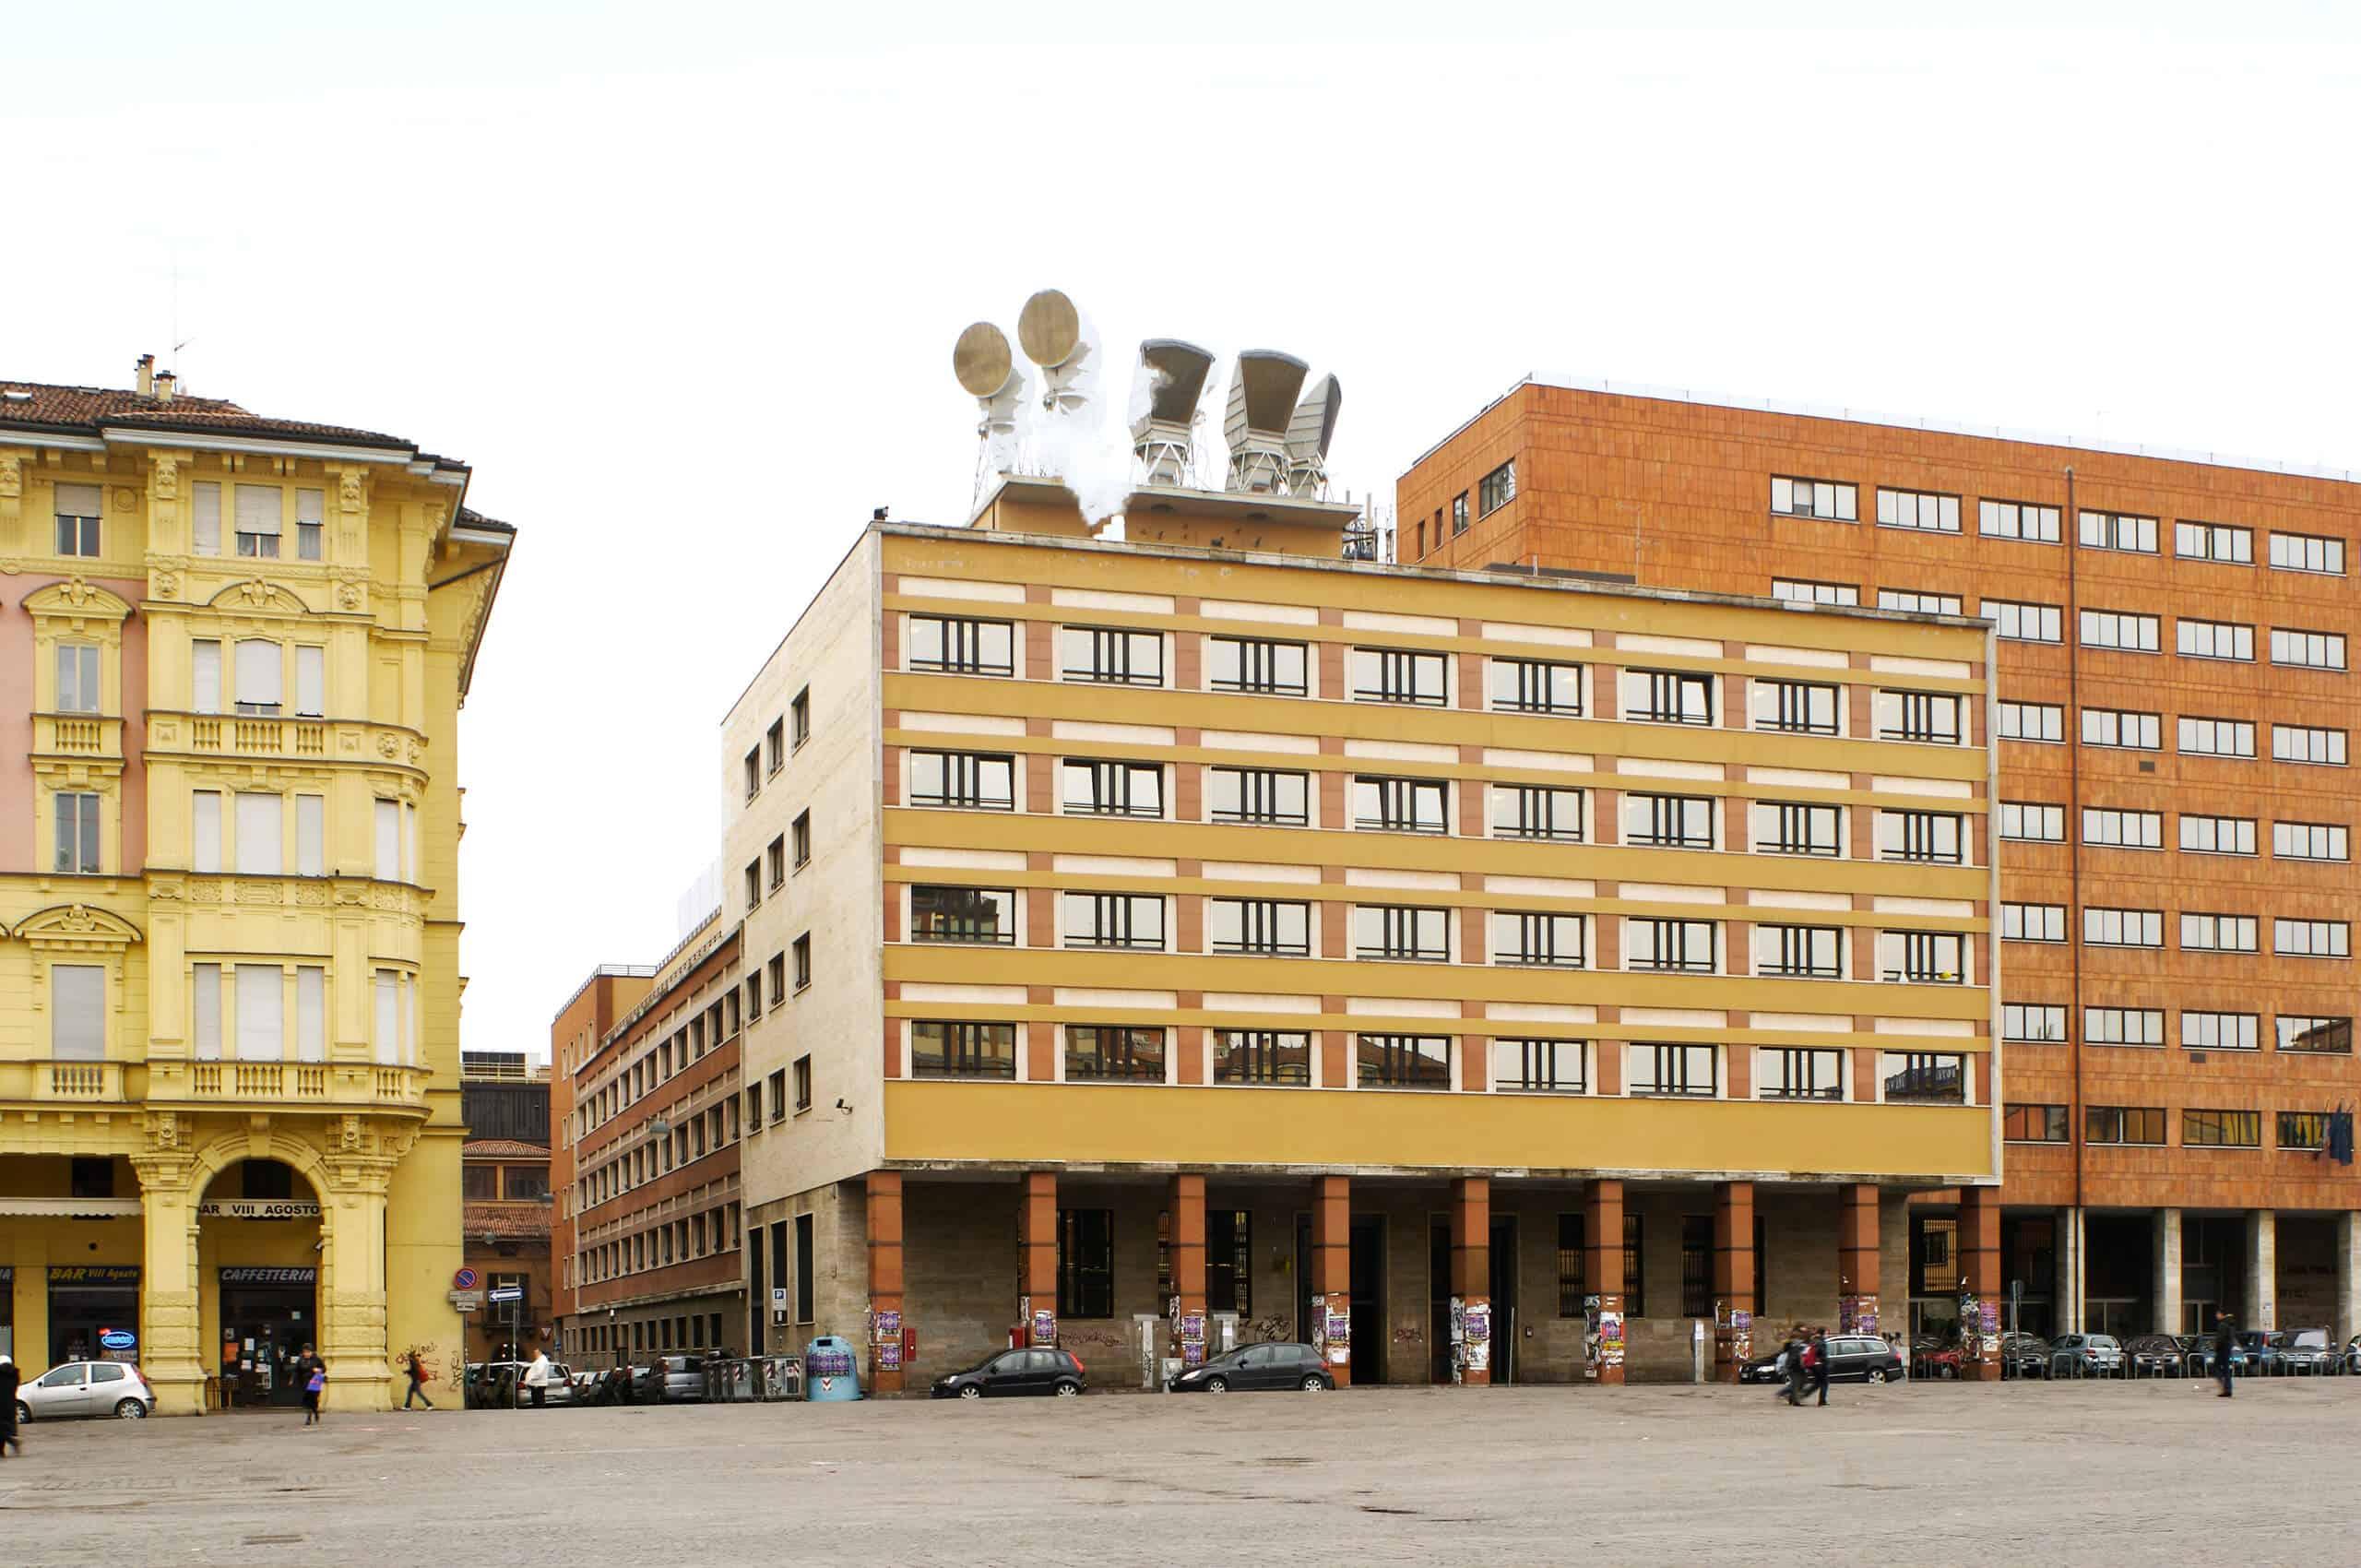 Central Sicaf - Bologna, Piazza VIII Agosto